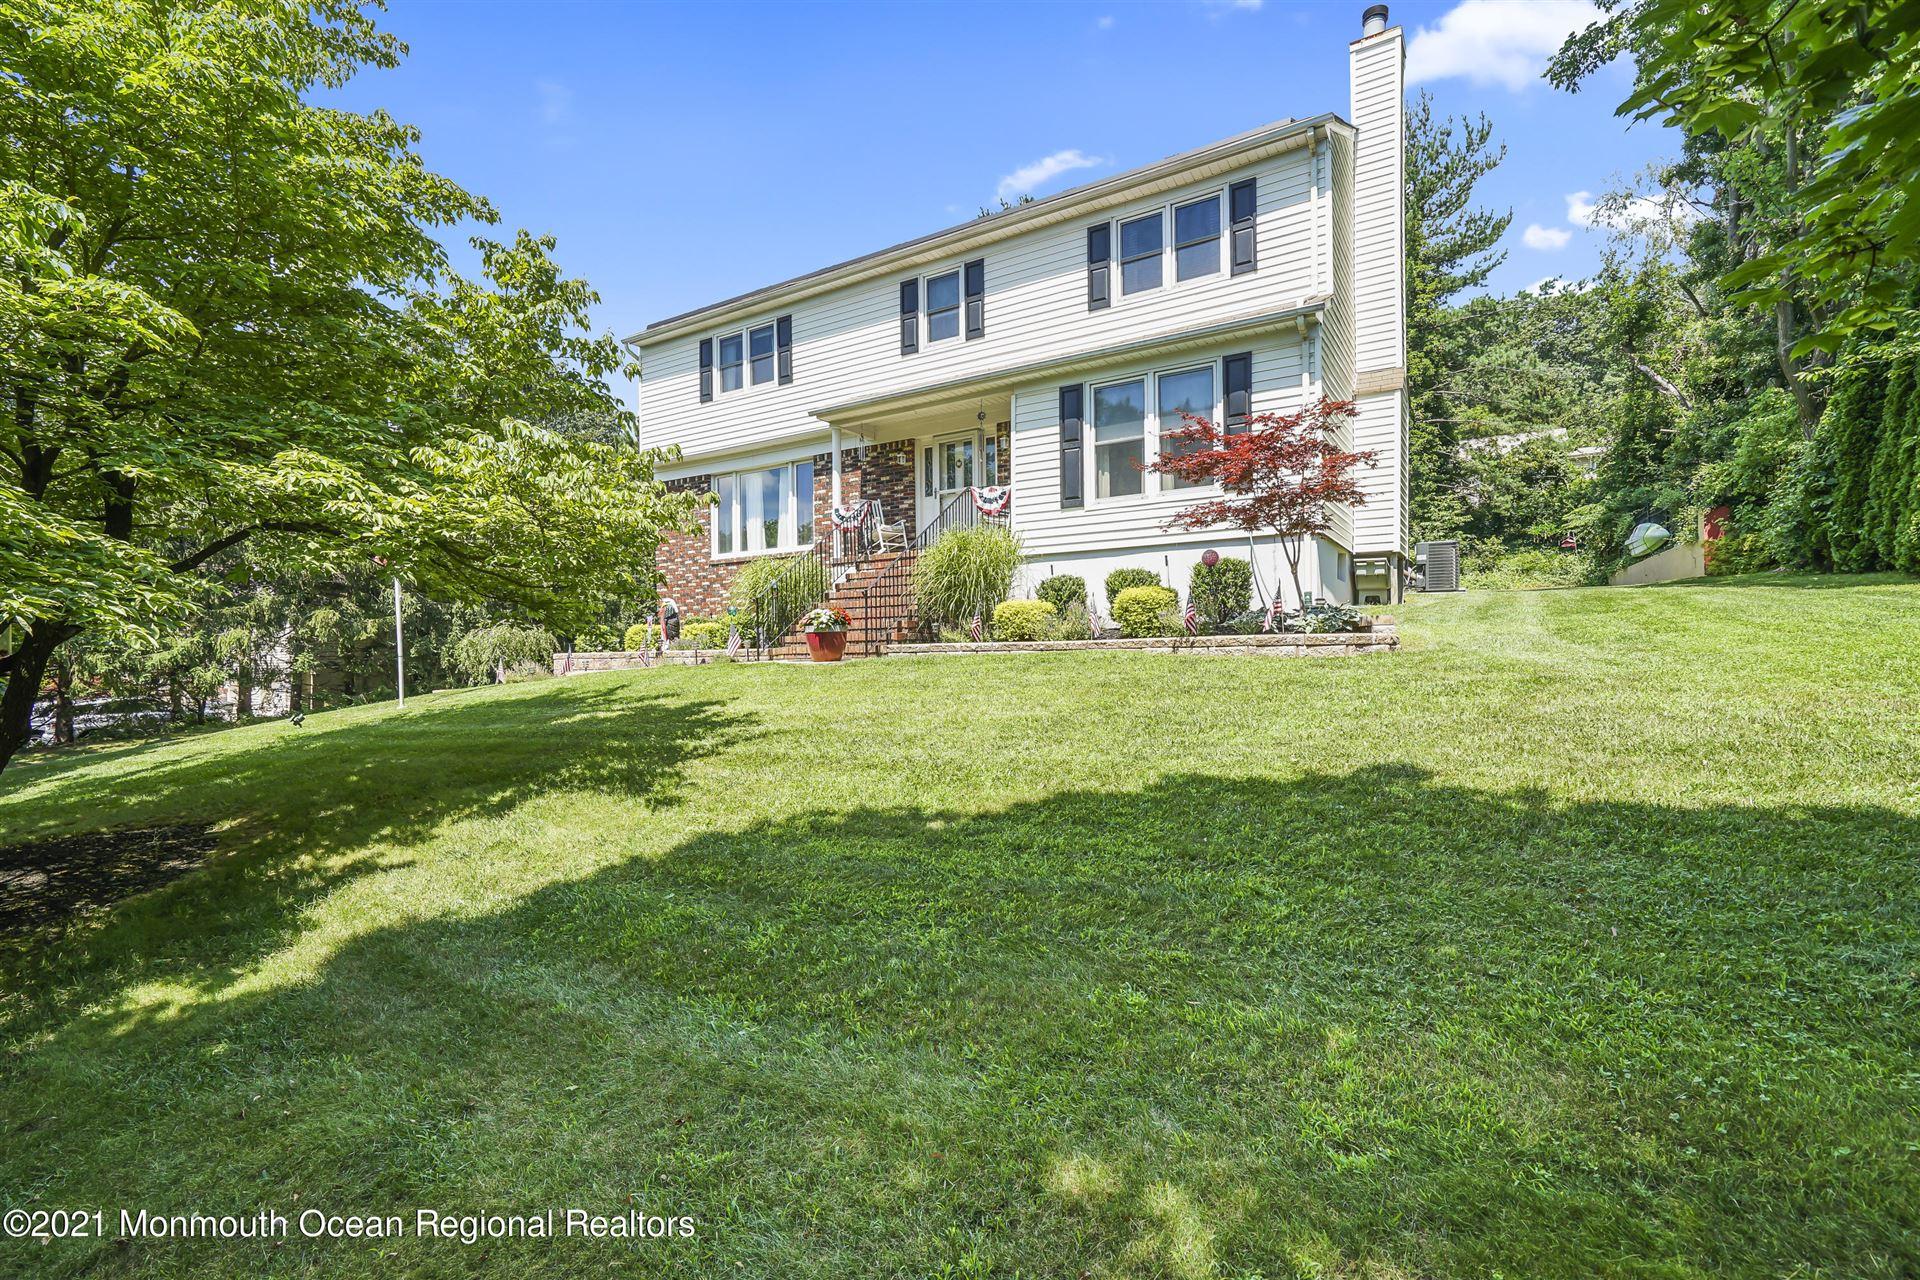 41 Stonehenge Drive, Ocean Township, NJ 07712 - MLS#: 22122493